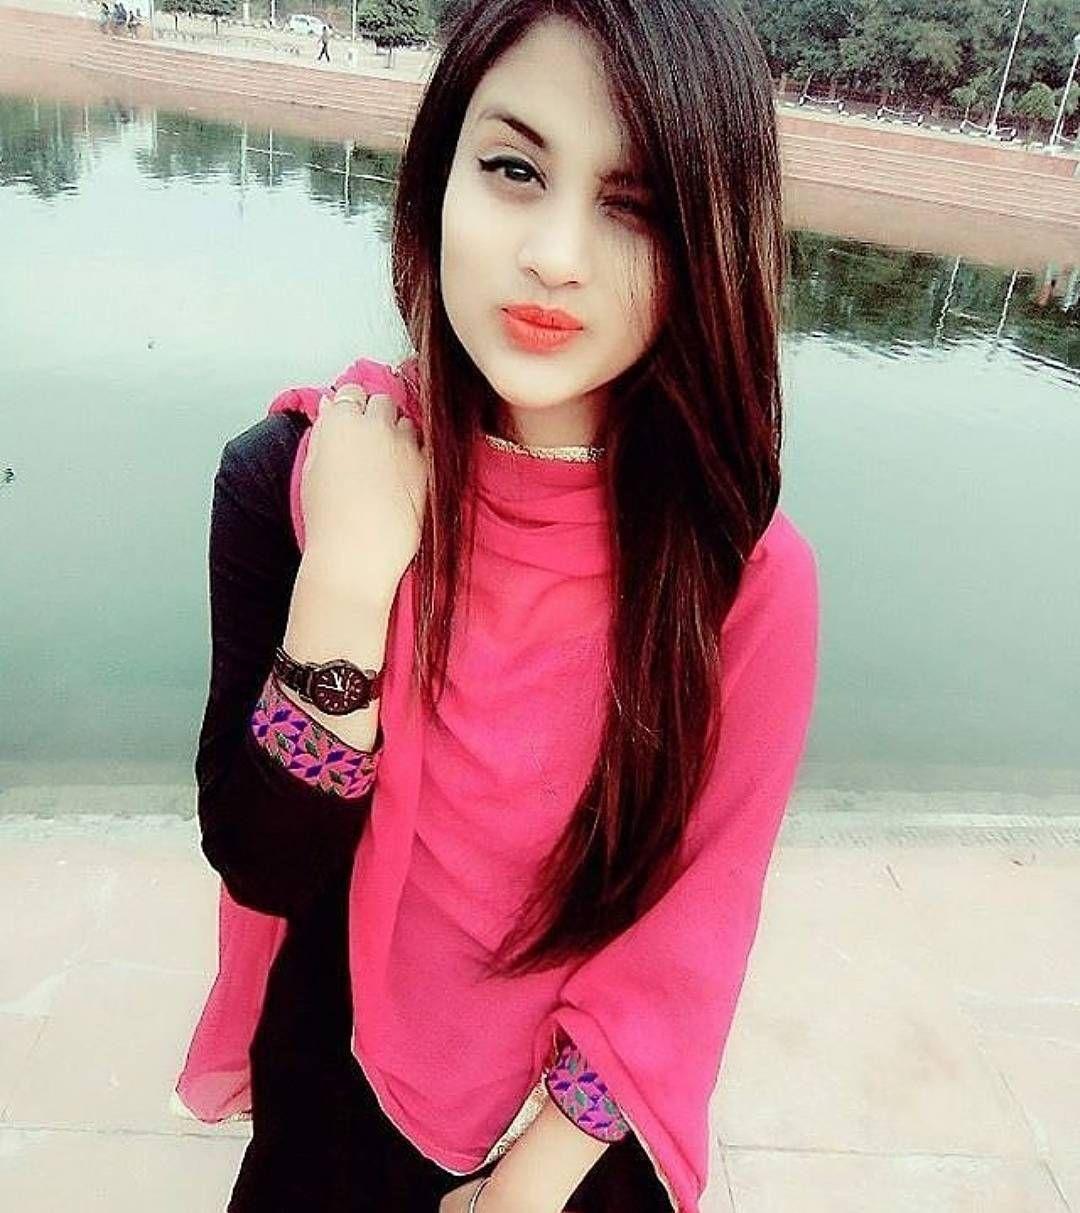 6,781 Likes, 159 Comments - pooja sharma 💖 😘 (@poojasharm.a)